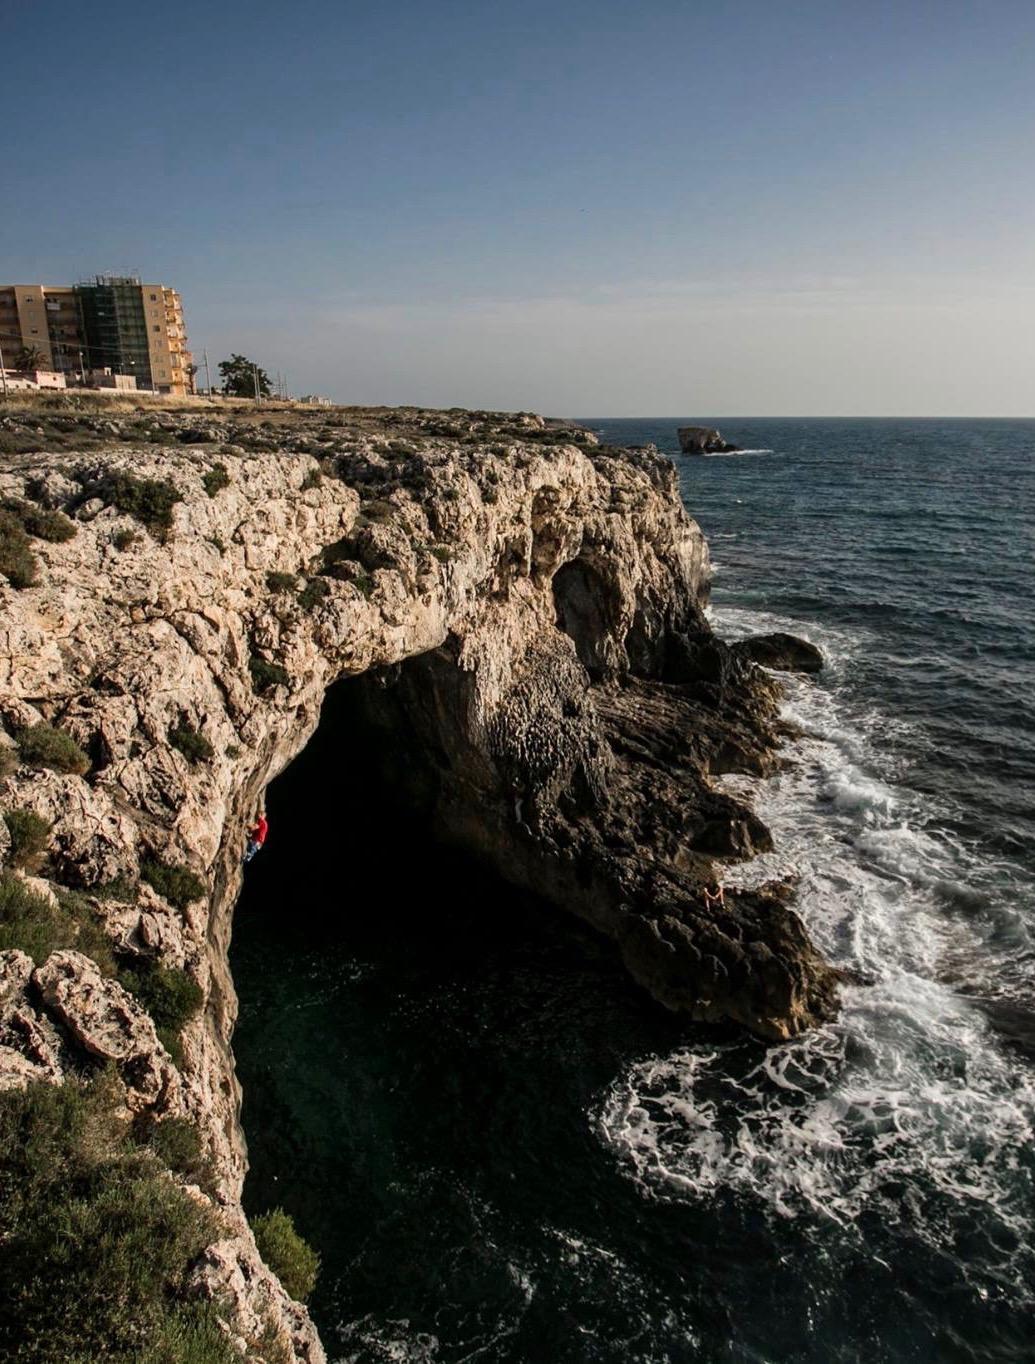 DWS crag near to Syracusa, where Sirocco is located.  Photo: Roberto Zampino